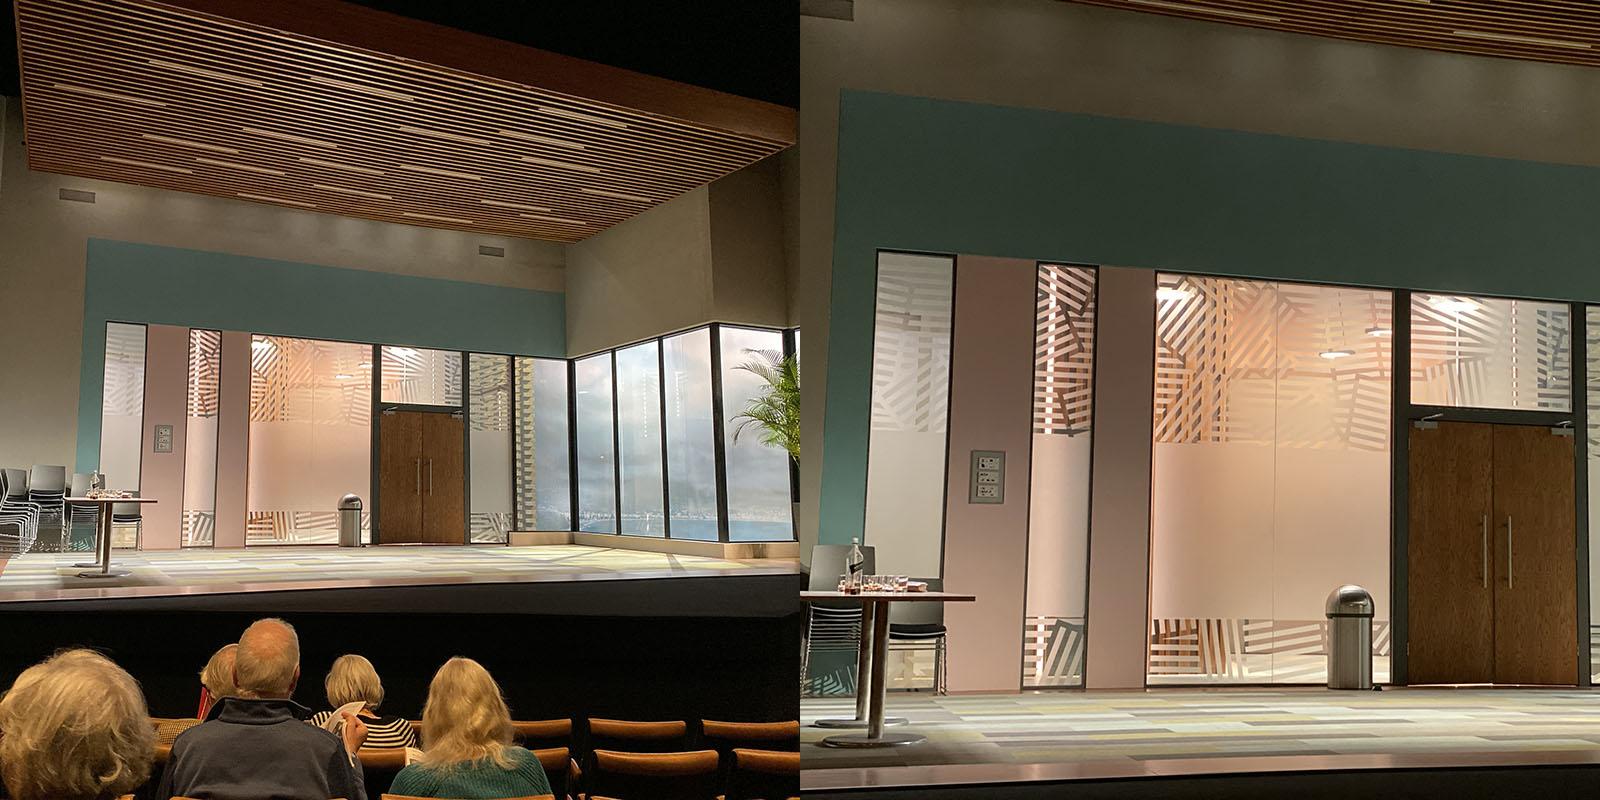 Theatre 1x vs 2x lens – very similar quality